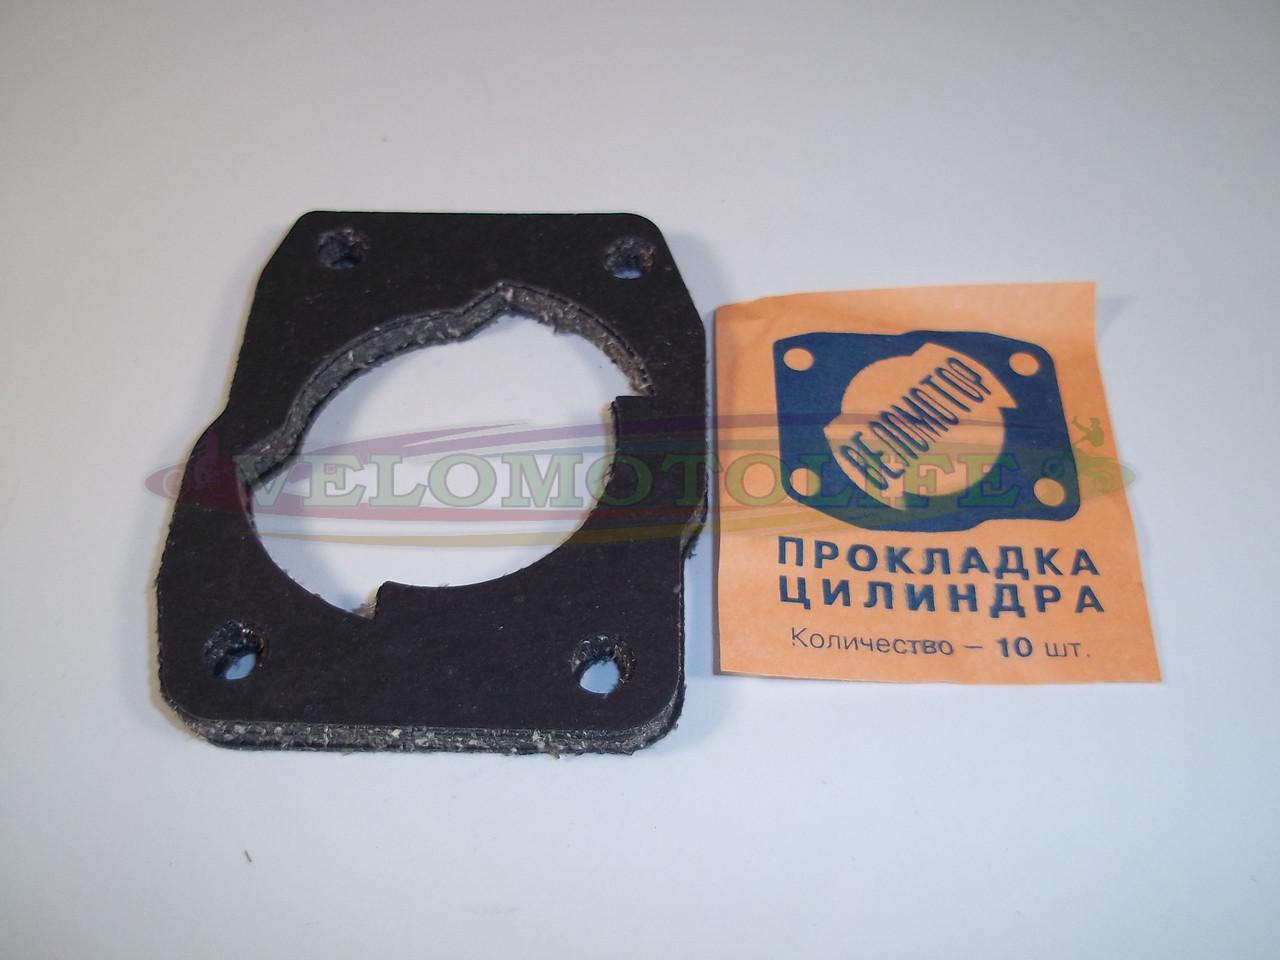 Прокладка цилиндра Веломотор